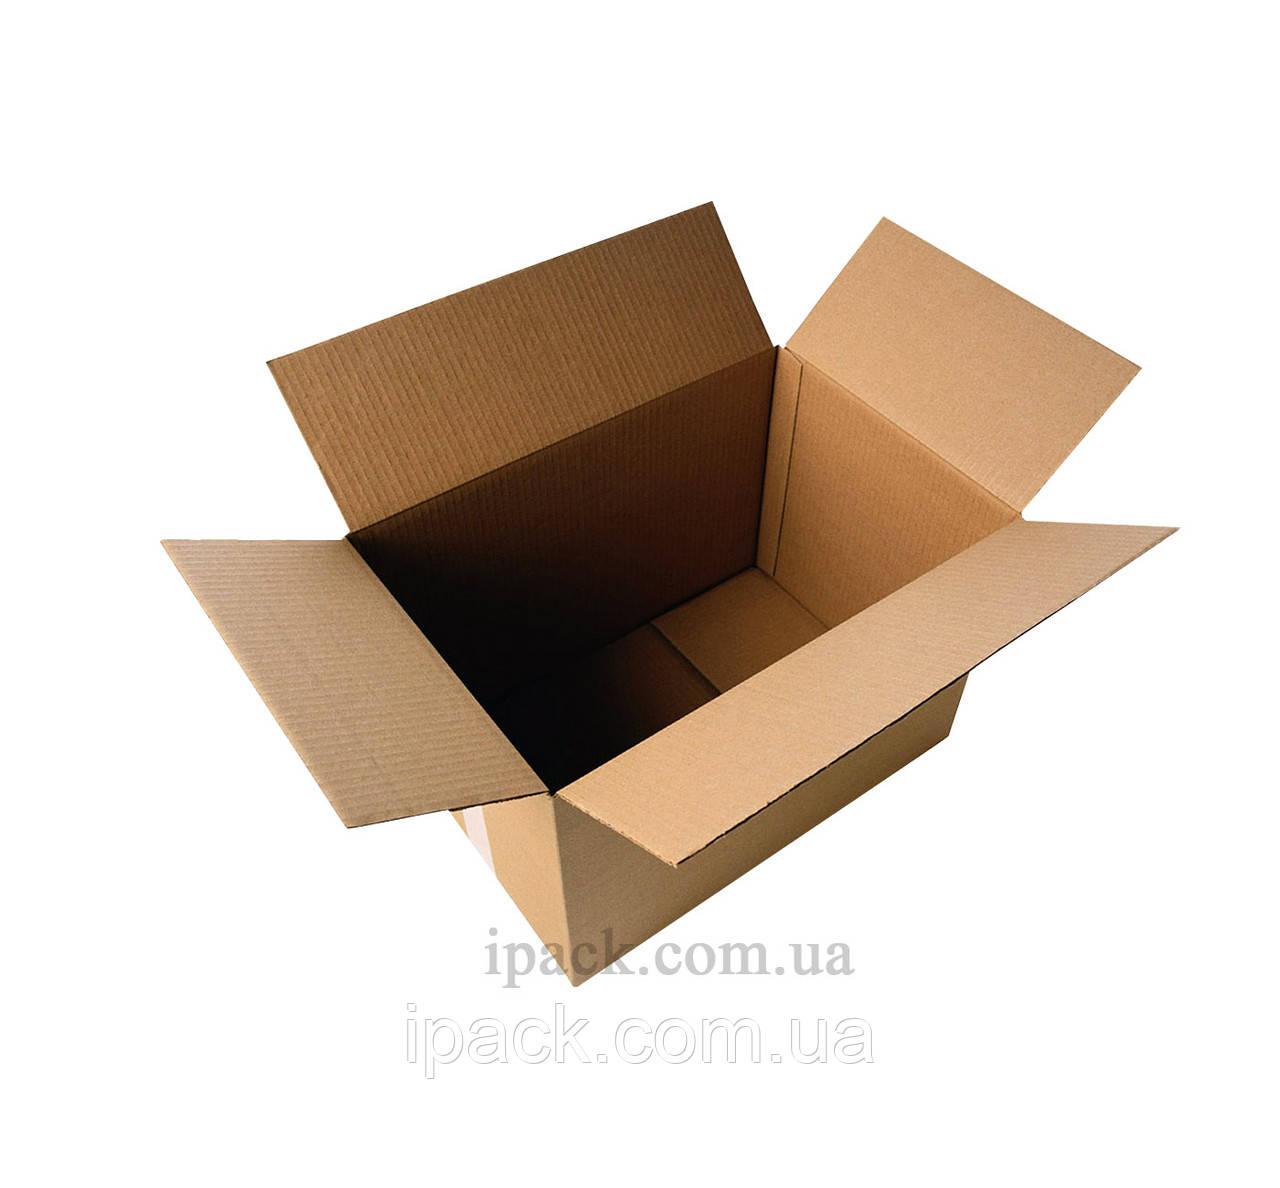 Гофроящик 395*248*290 мм, бурый, четырехклапанный картонный короб